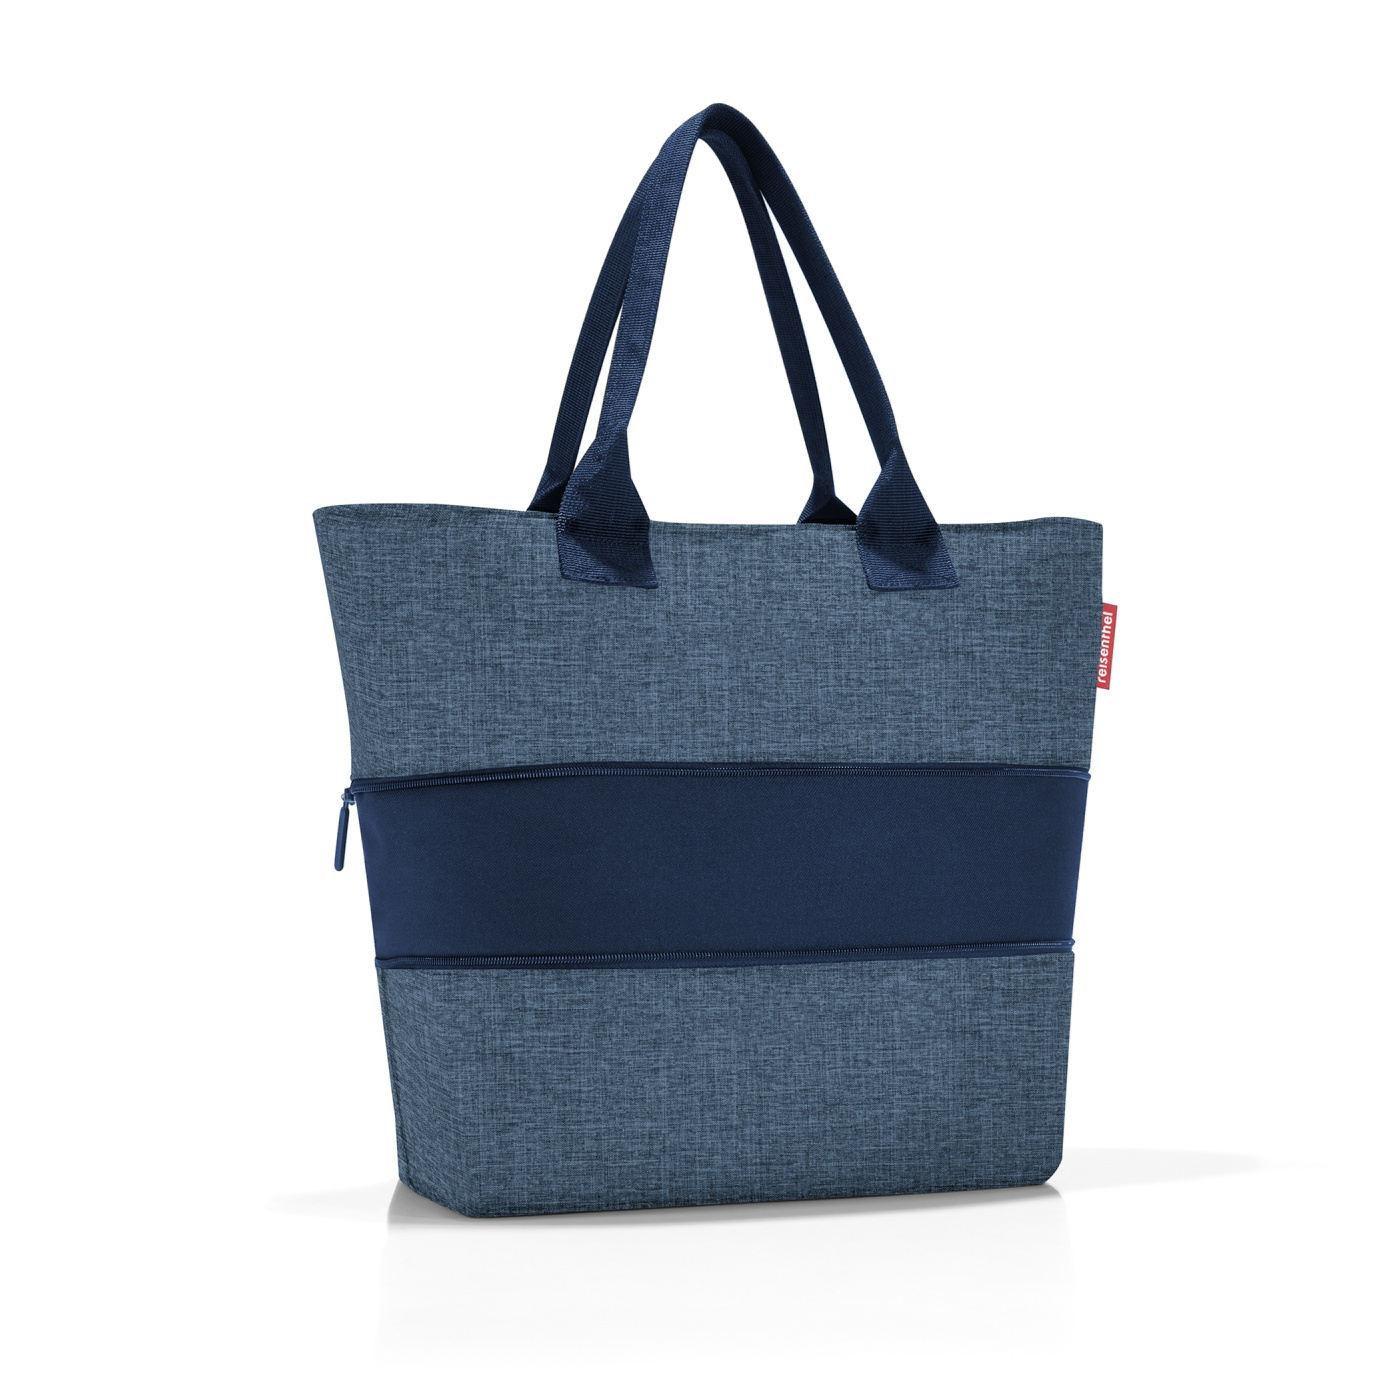 Chytrá taška přes rameno Shopper e1 twist blue_1